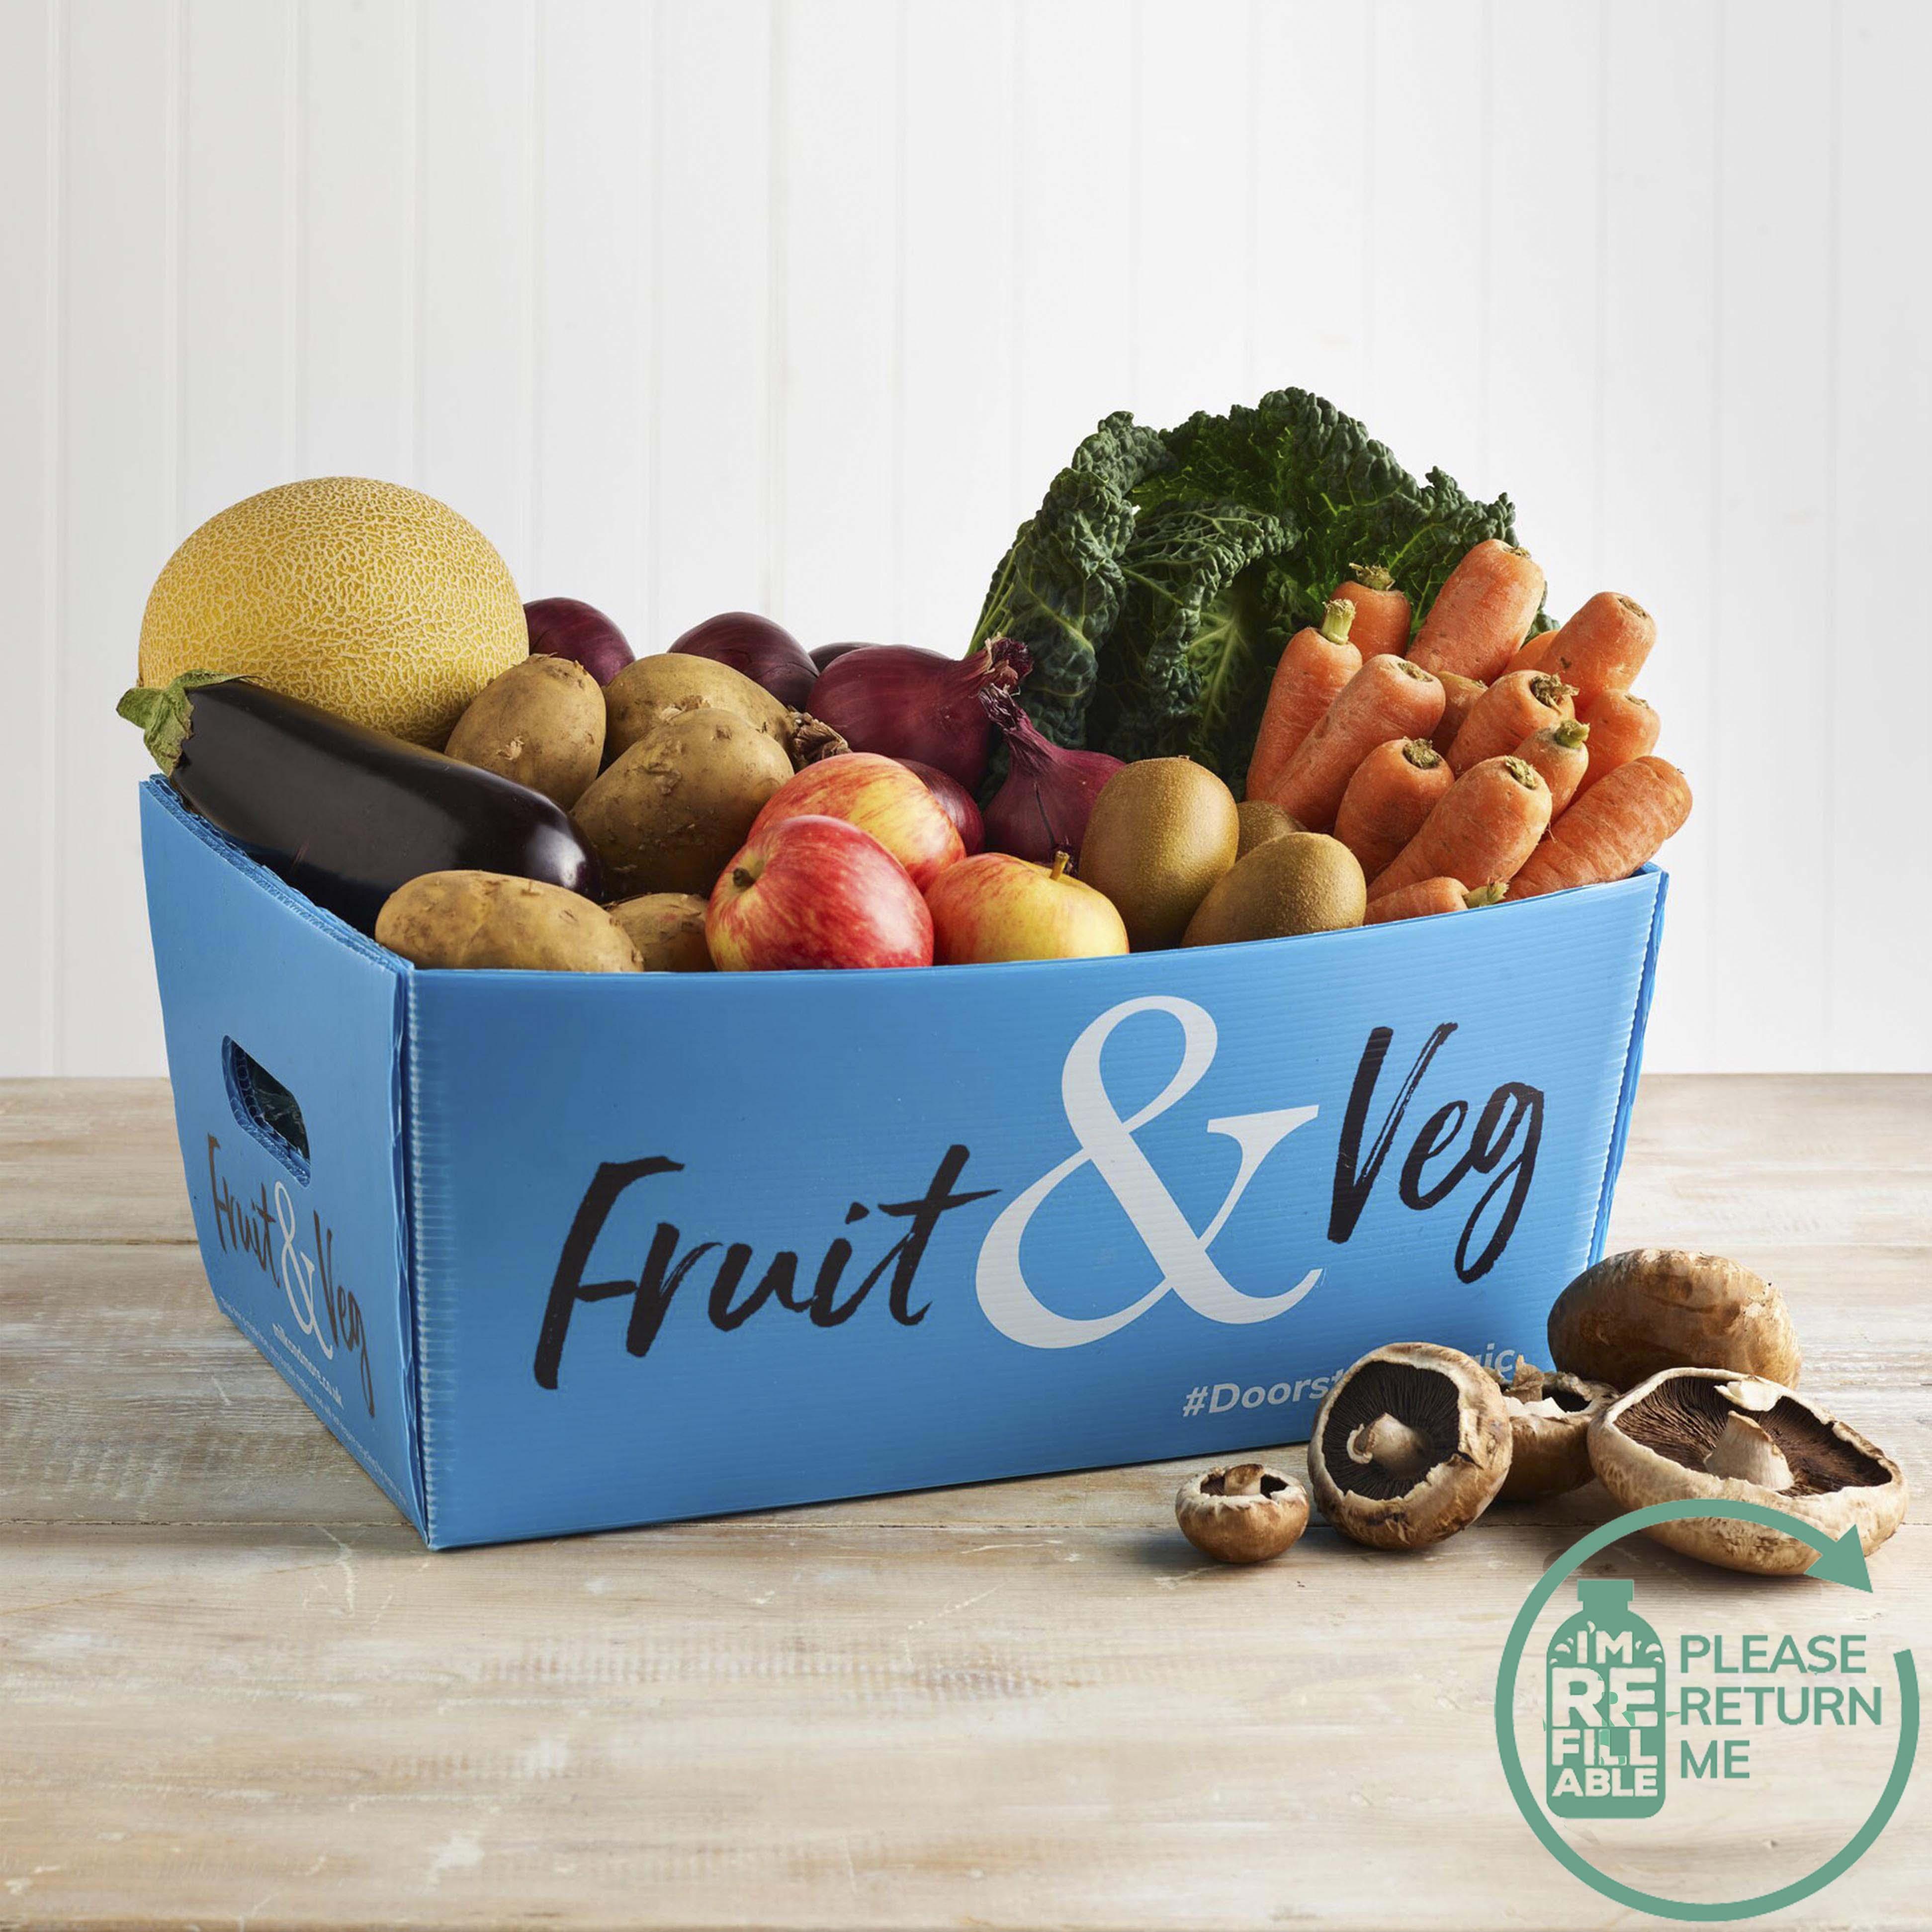 Seasonal Organic Fruit & Veg Box